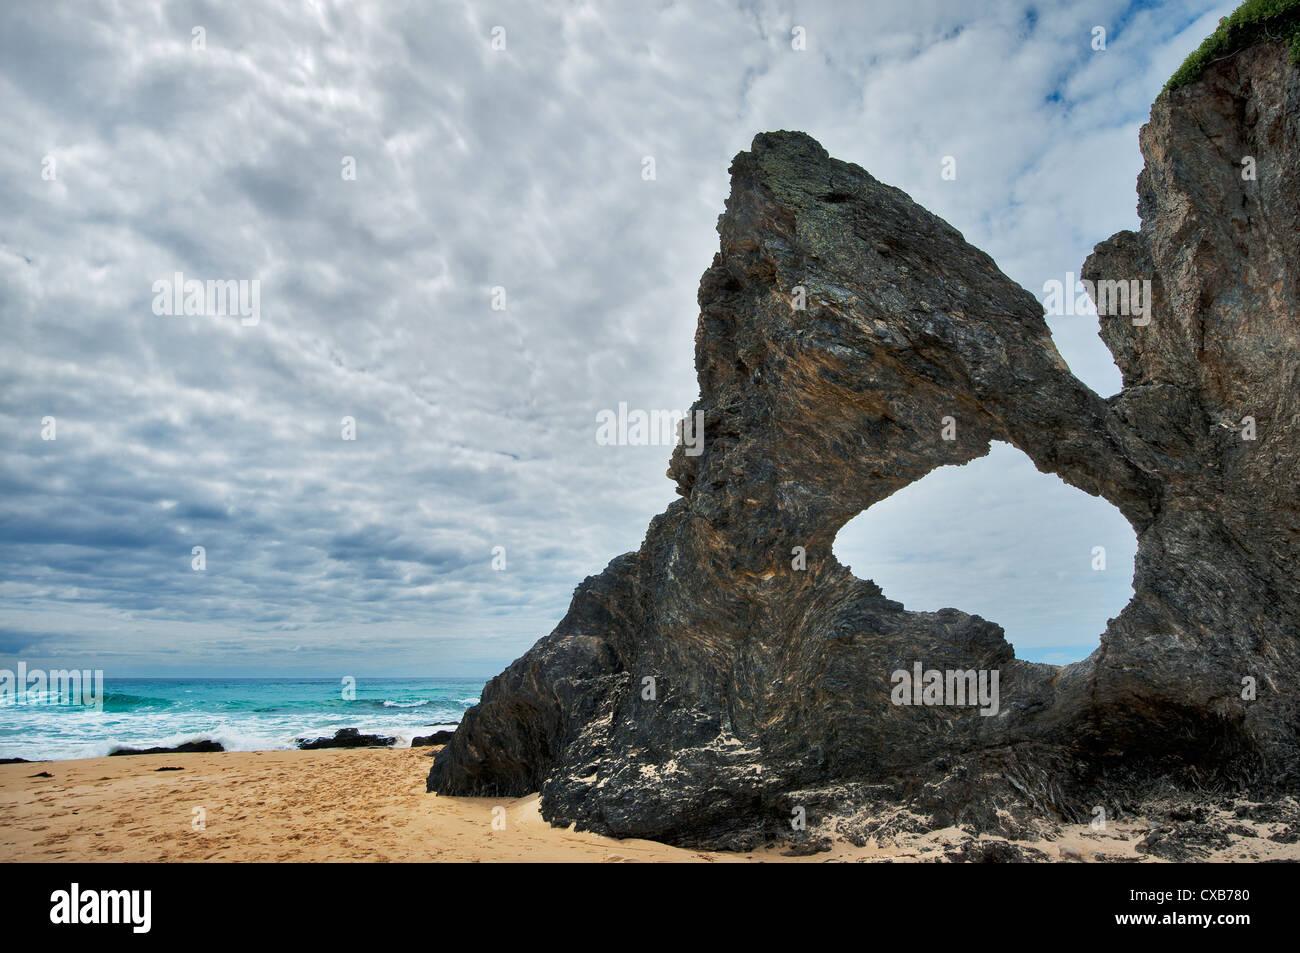 Famous Australia Rock at the beach of Narooma. Stock Photo